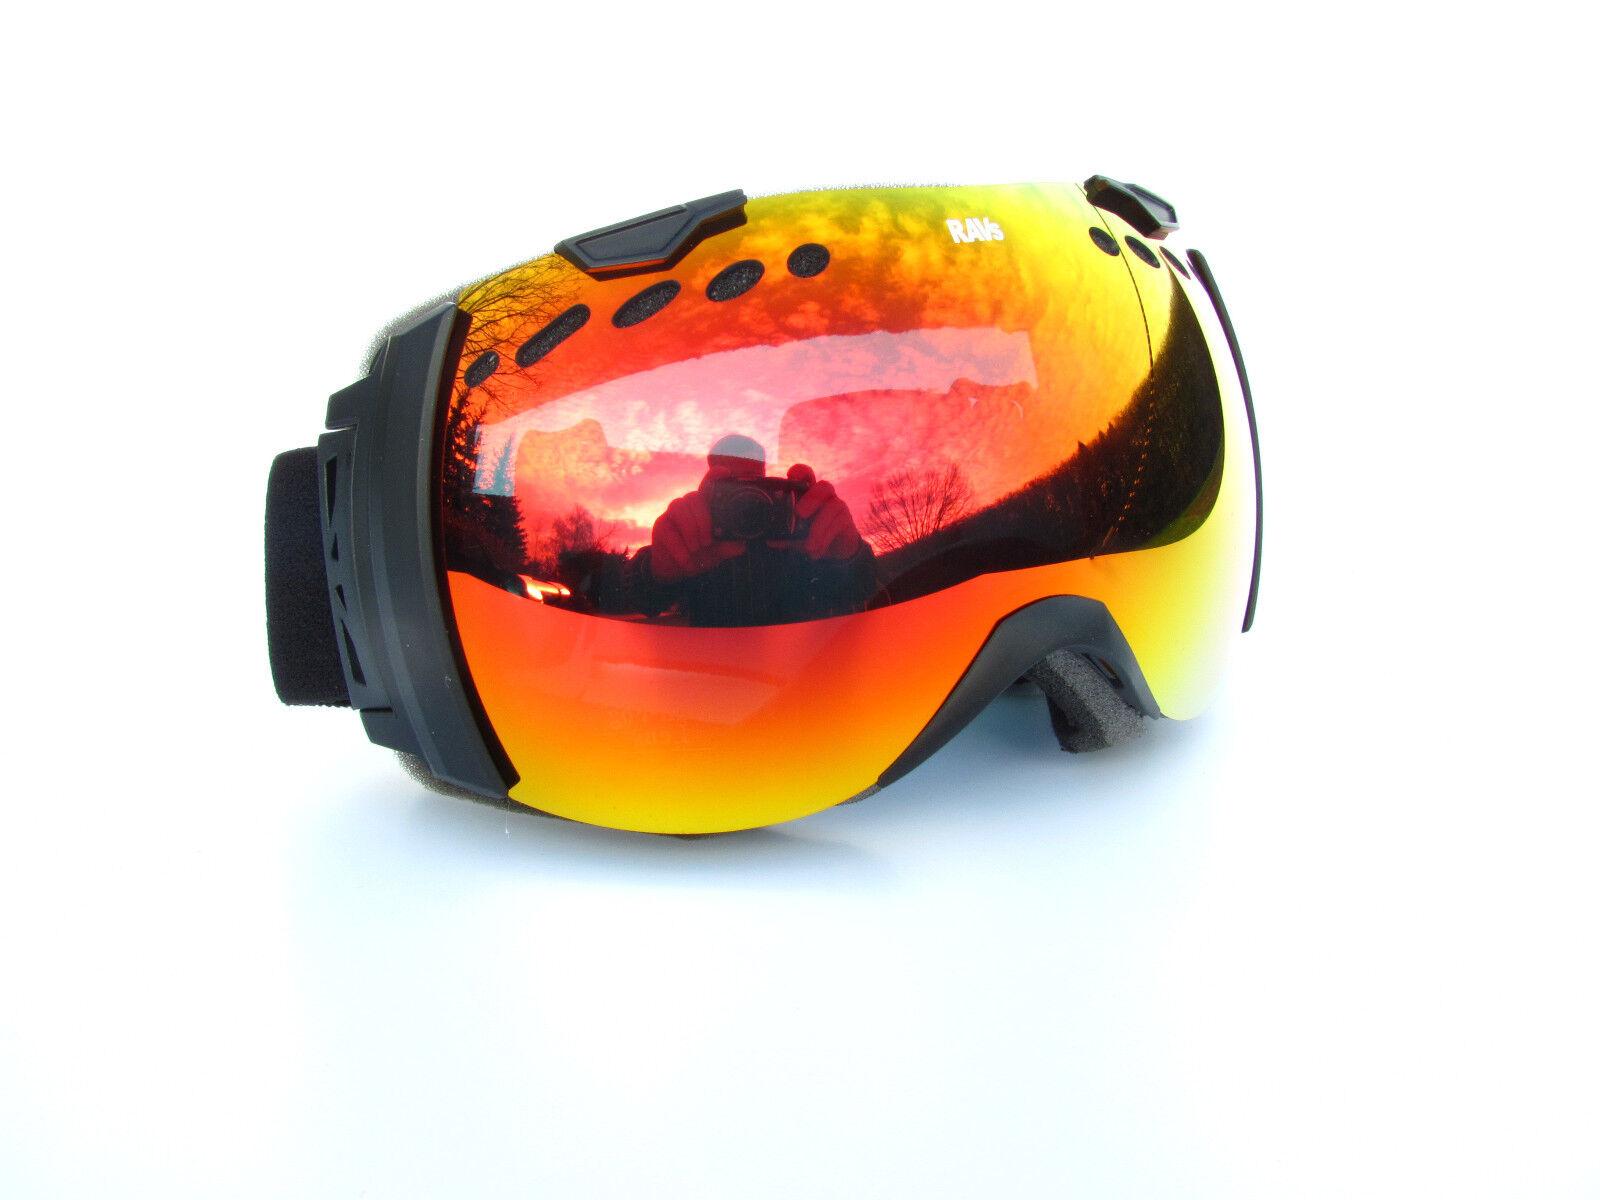 RAVS Skibrille Schutzbrille ski goggle auch für BRILLENTRÄGER (over the the the glasses) 30c1cc